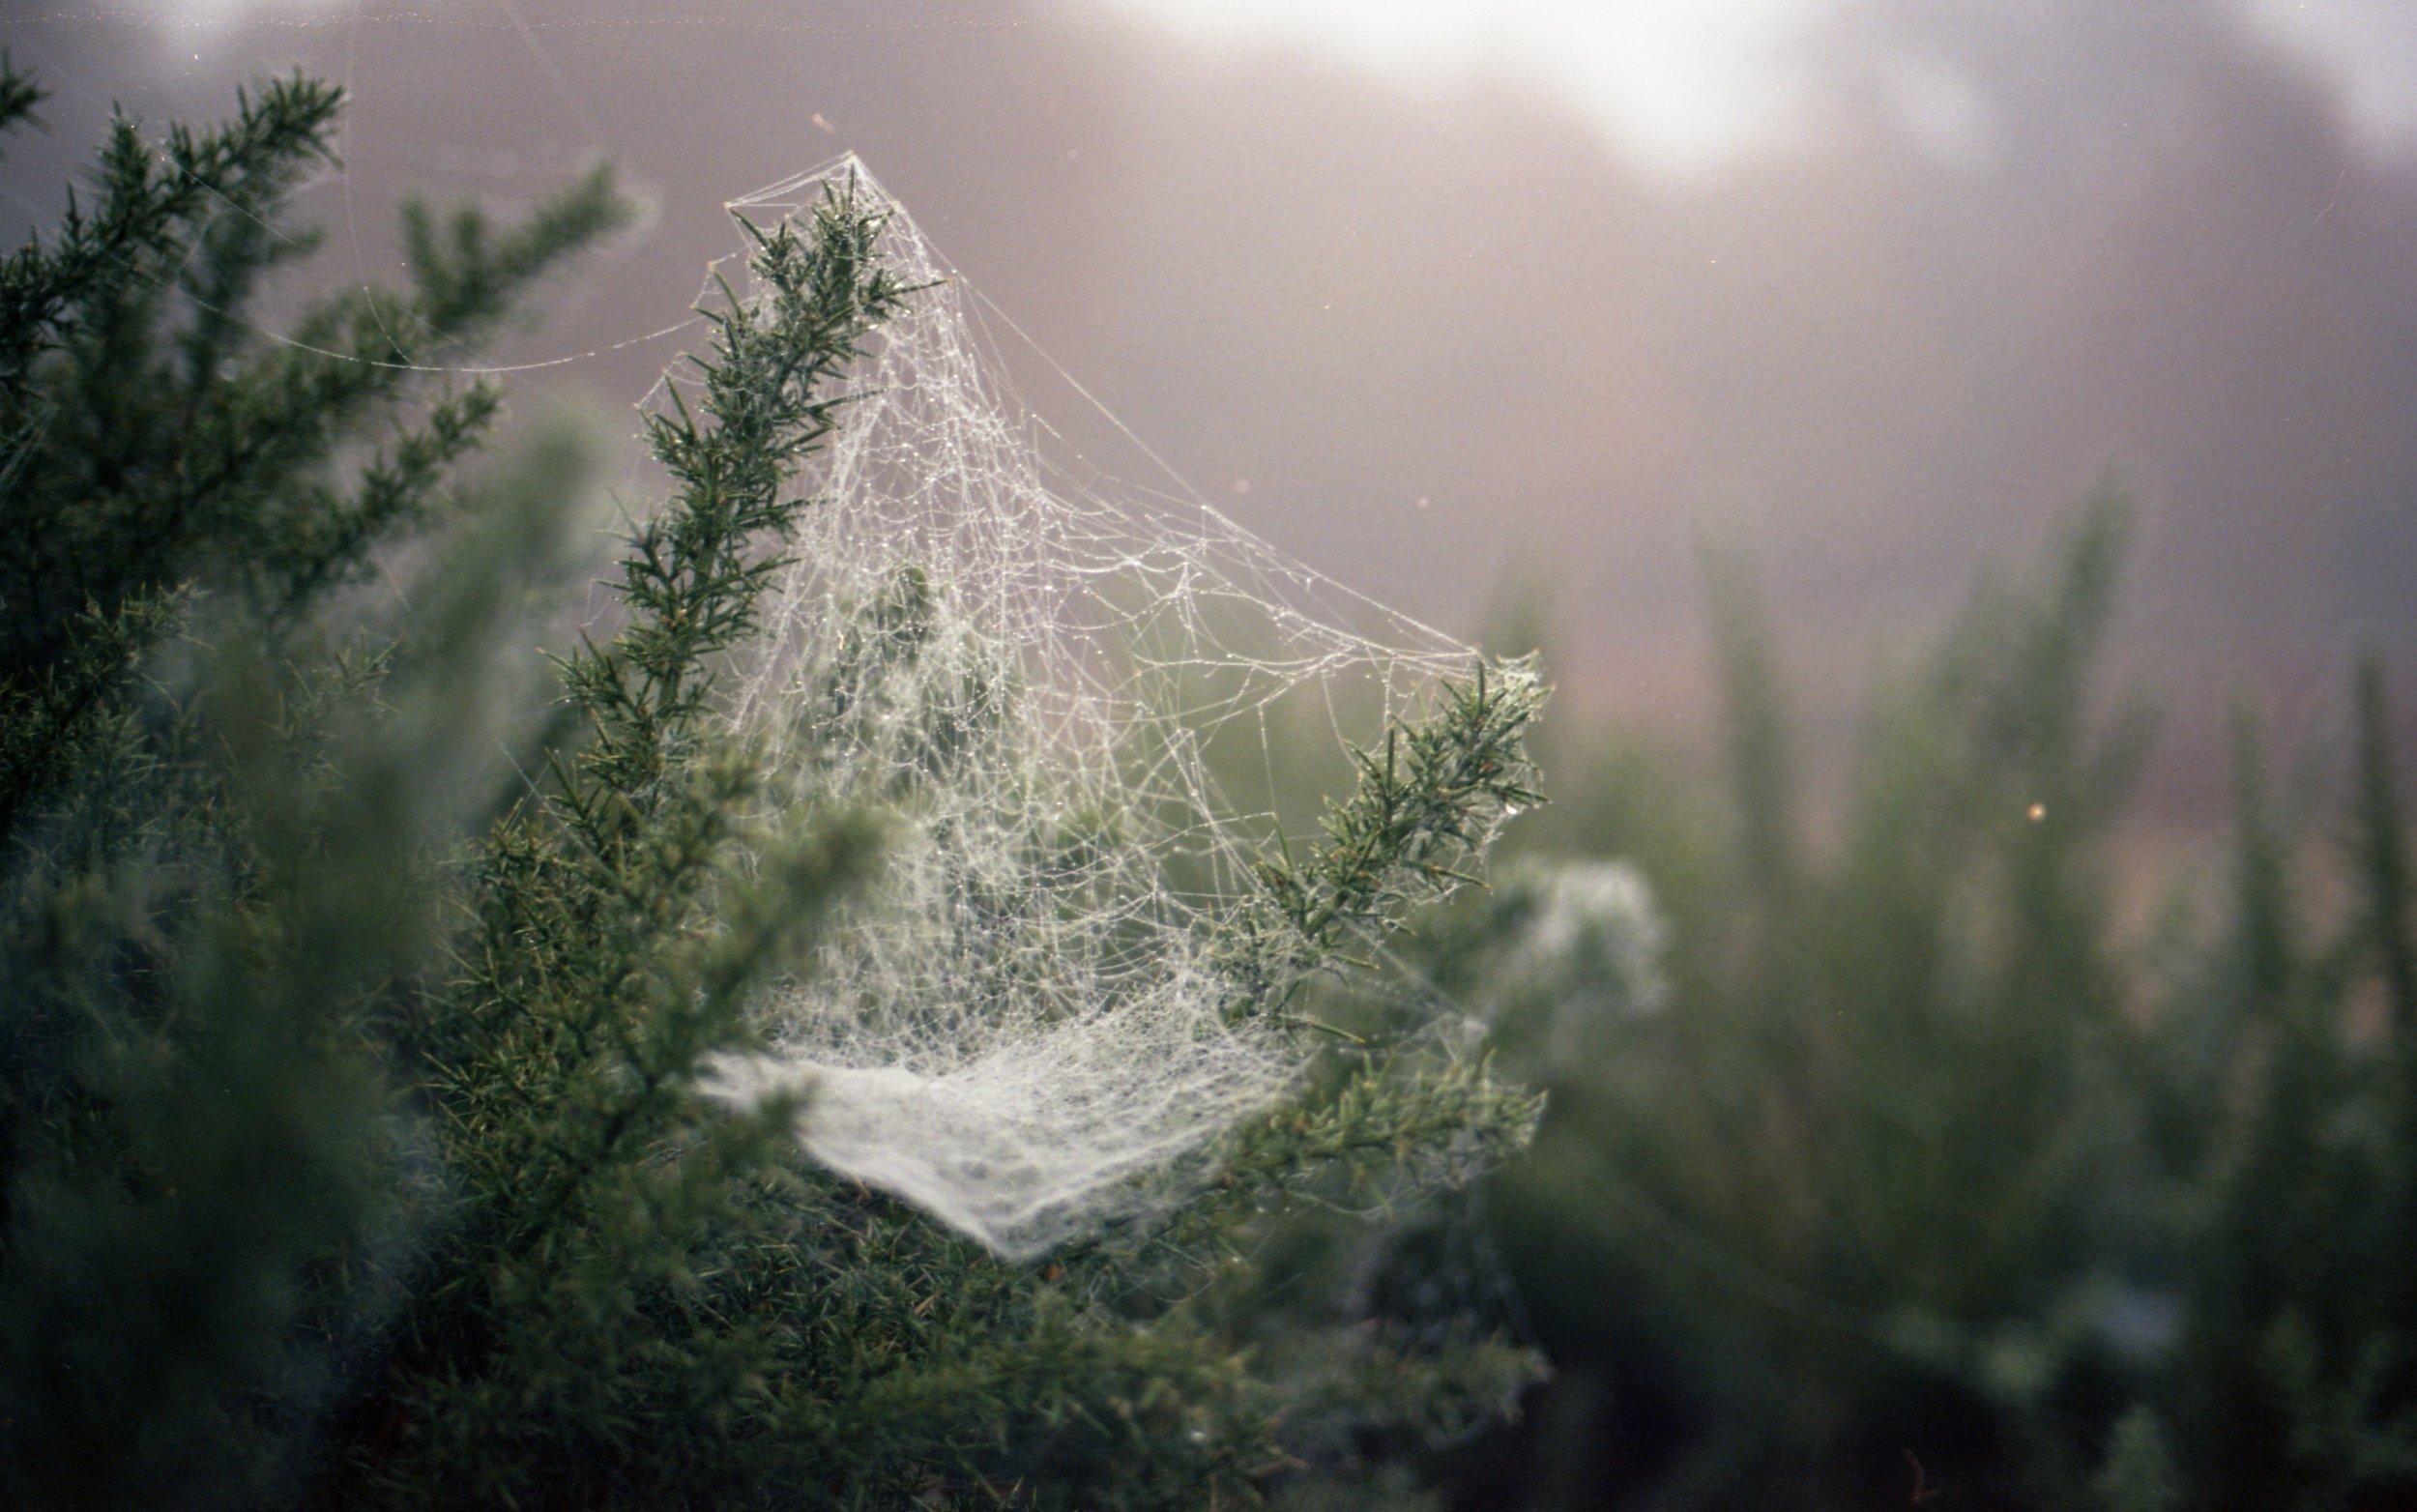 The Veil | Canon AE-1 Program | Kodak Ektar 100 | Katia Shipulina